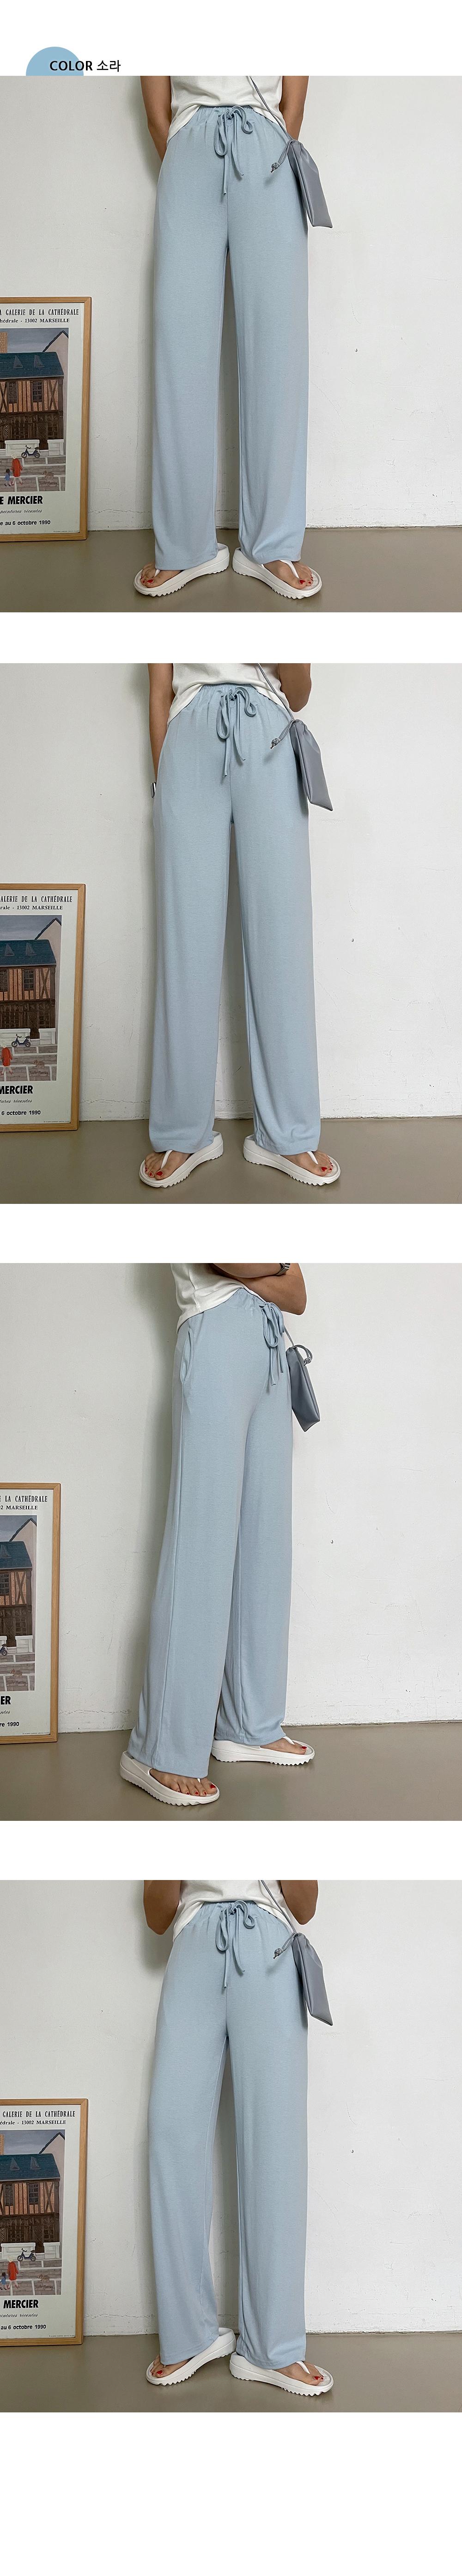 Chalange Rayon Spandex Banding Pants